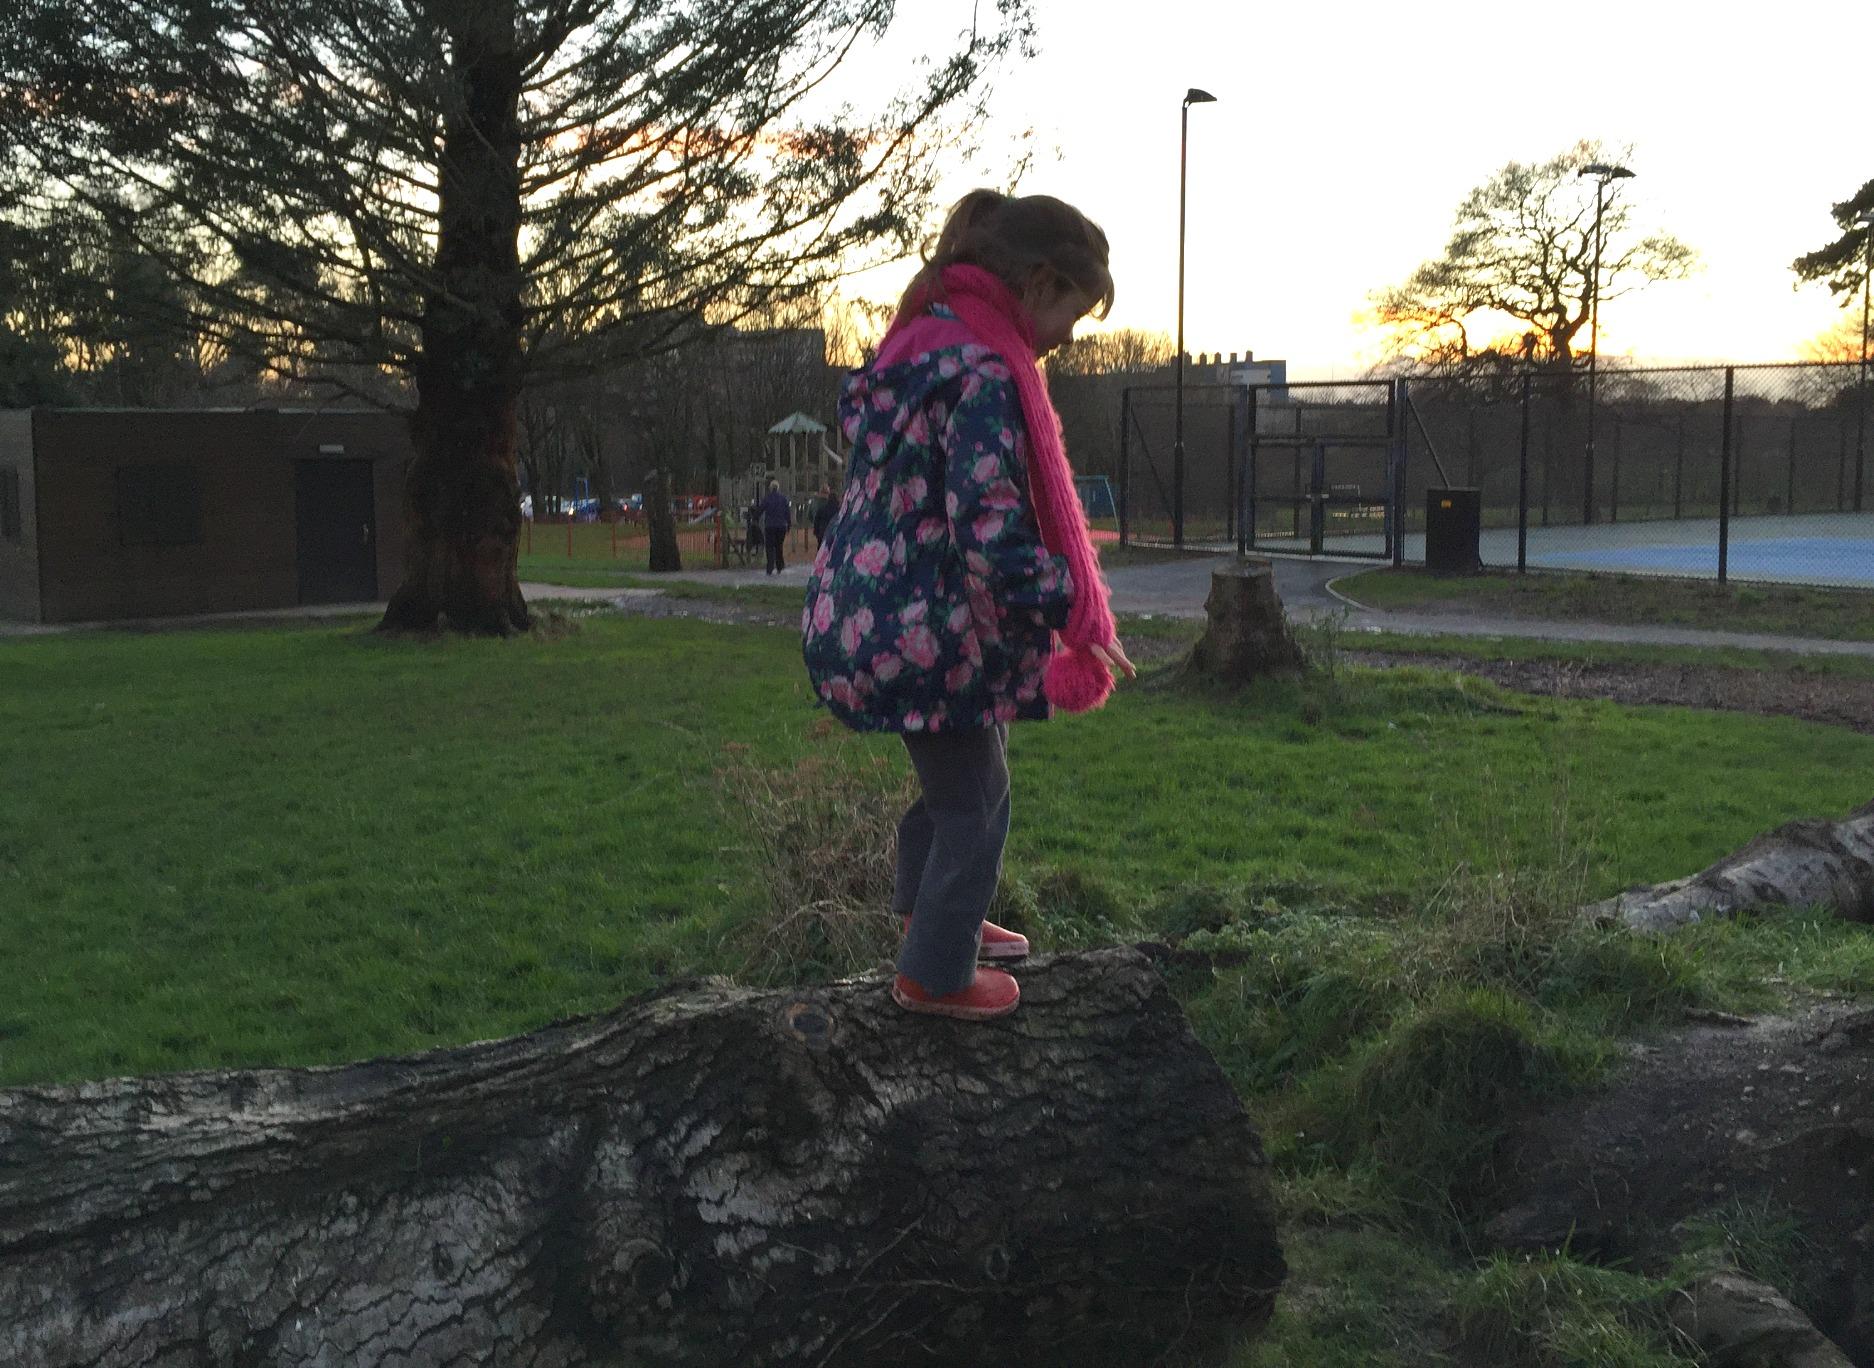 Girls climb trees